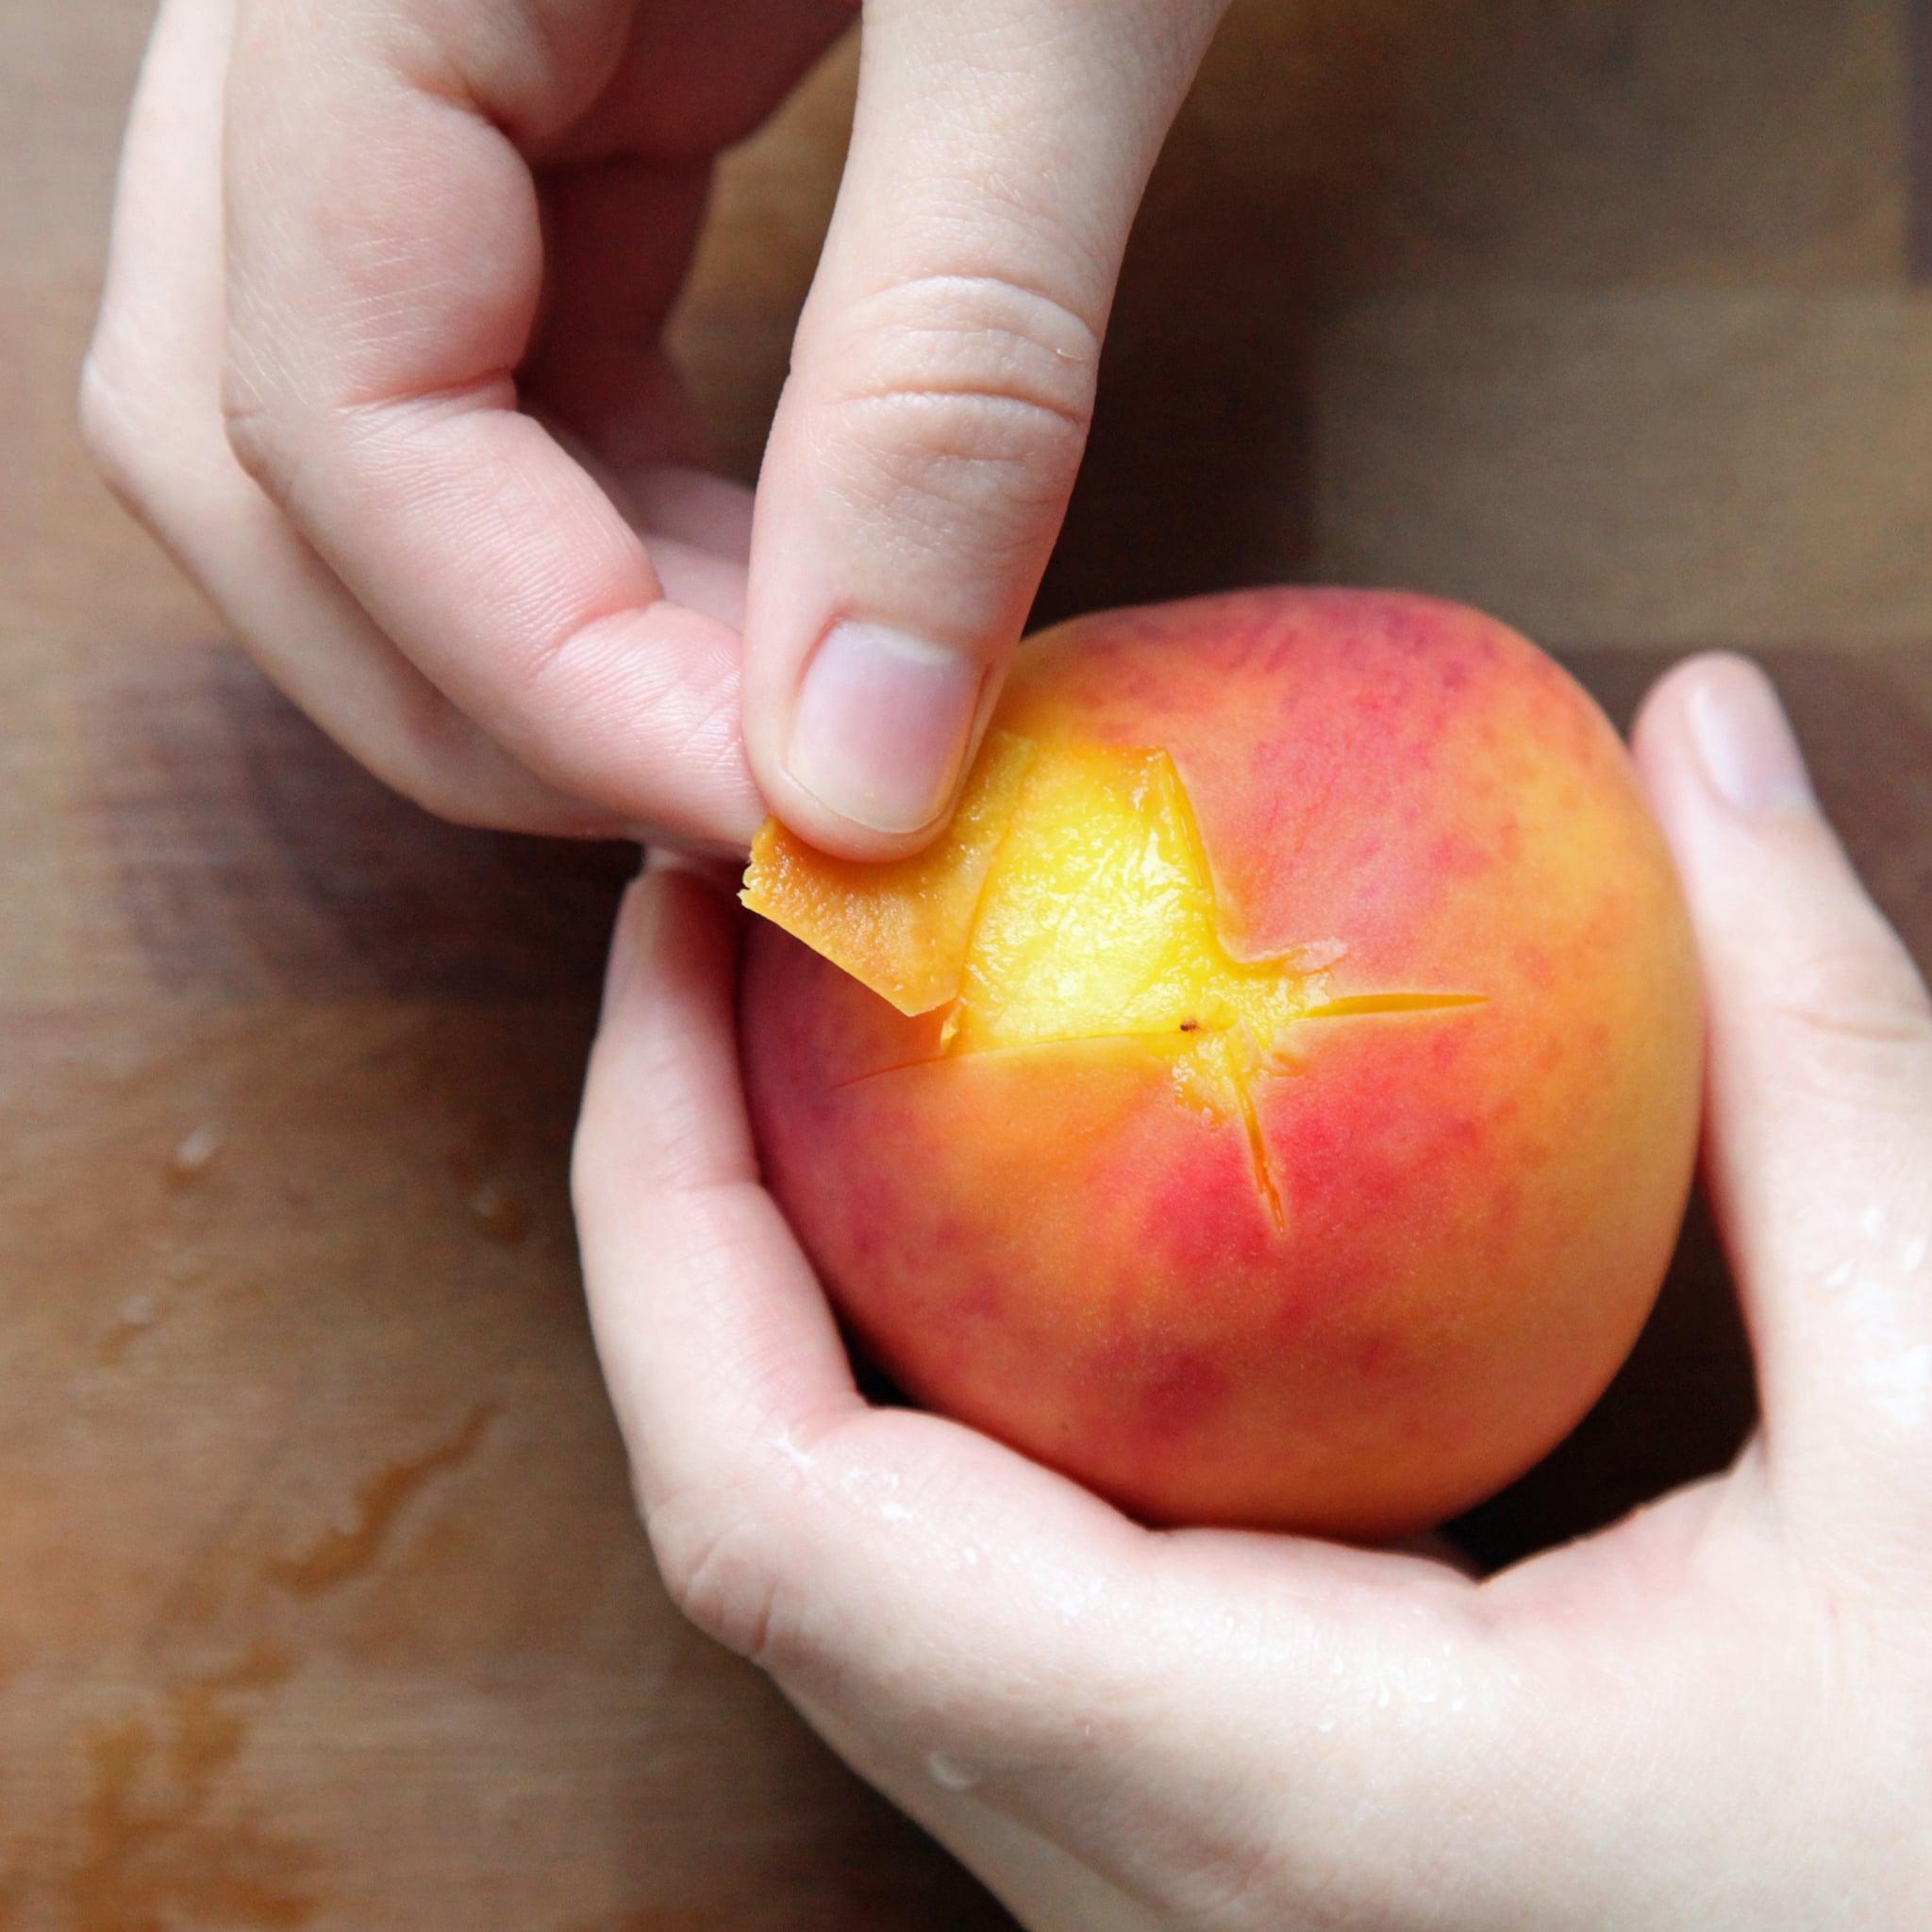 Peeling Peaches Easily